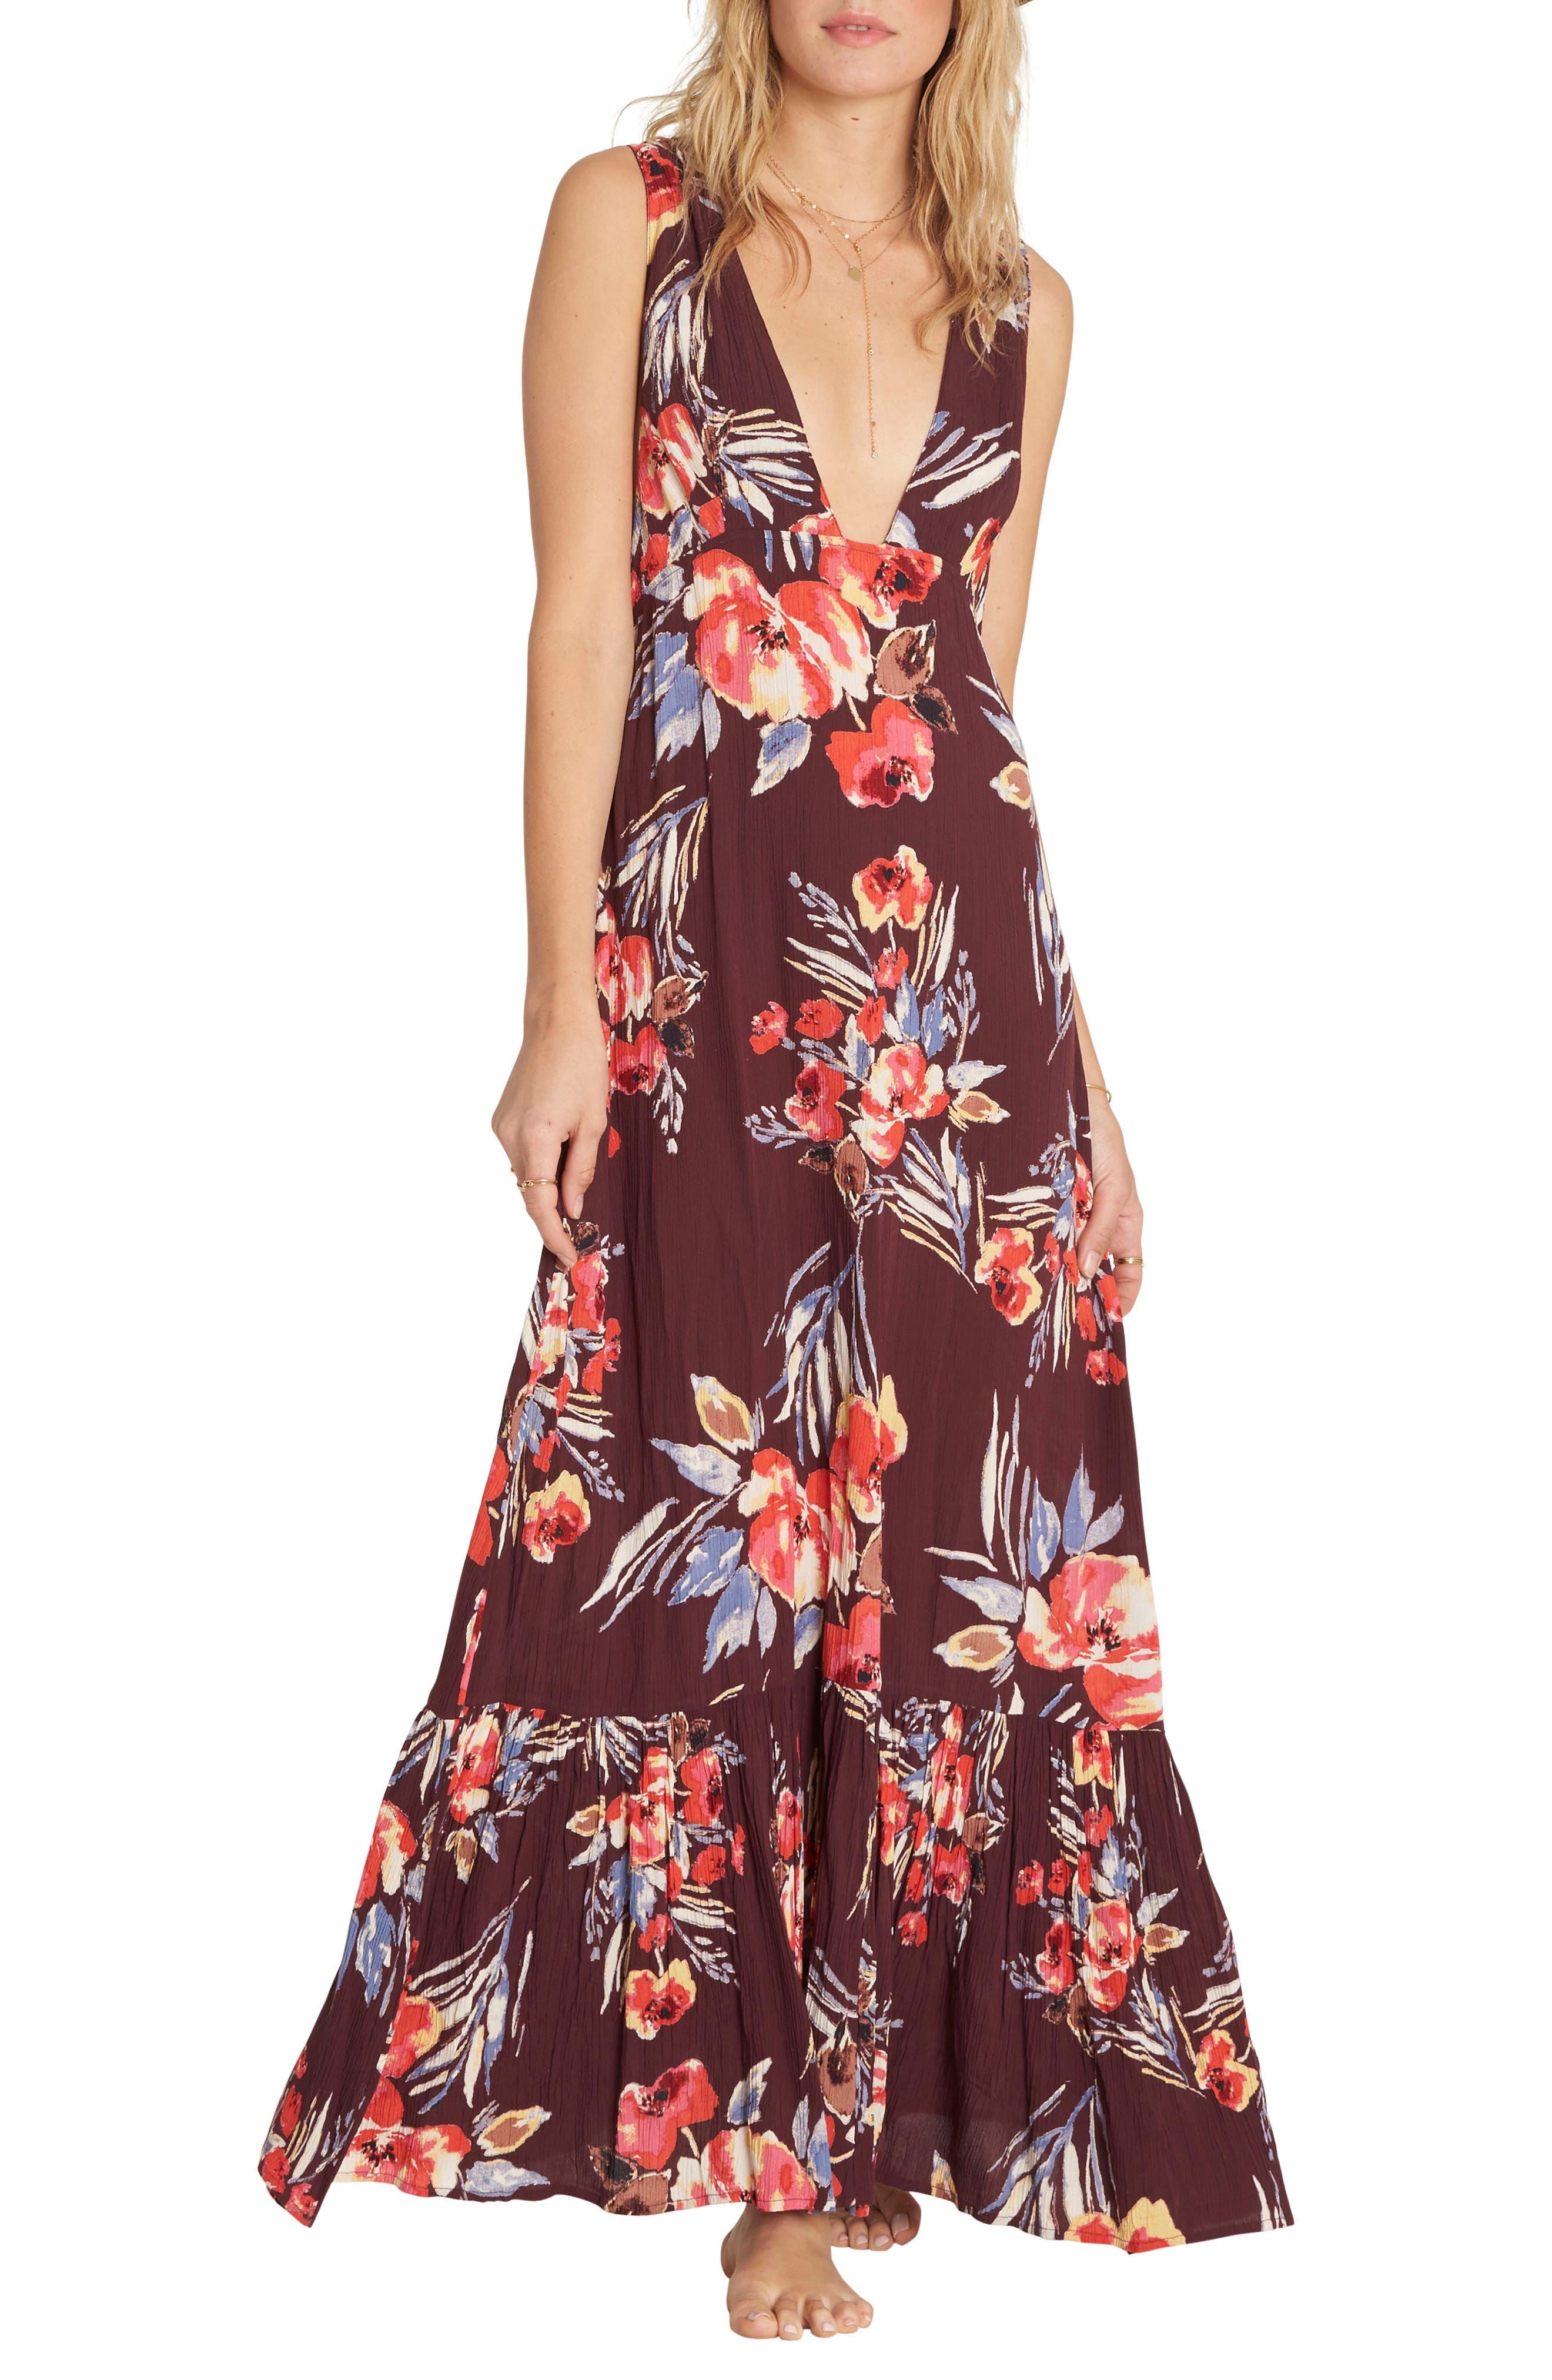 Main Image - Billabong Awoke for Waves Floral Print Maxi Dress